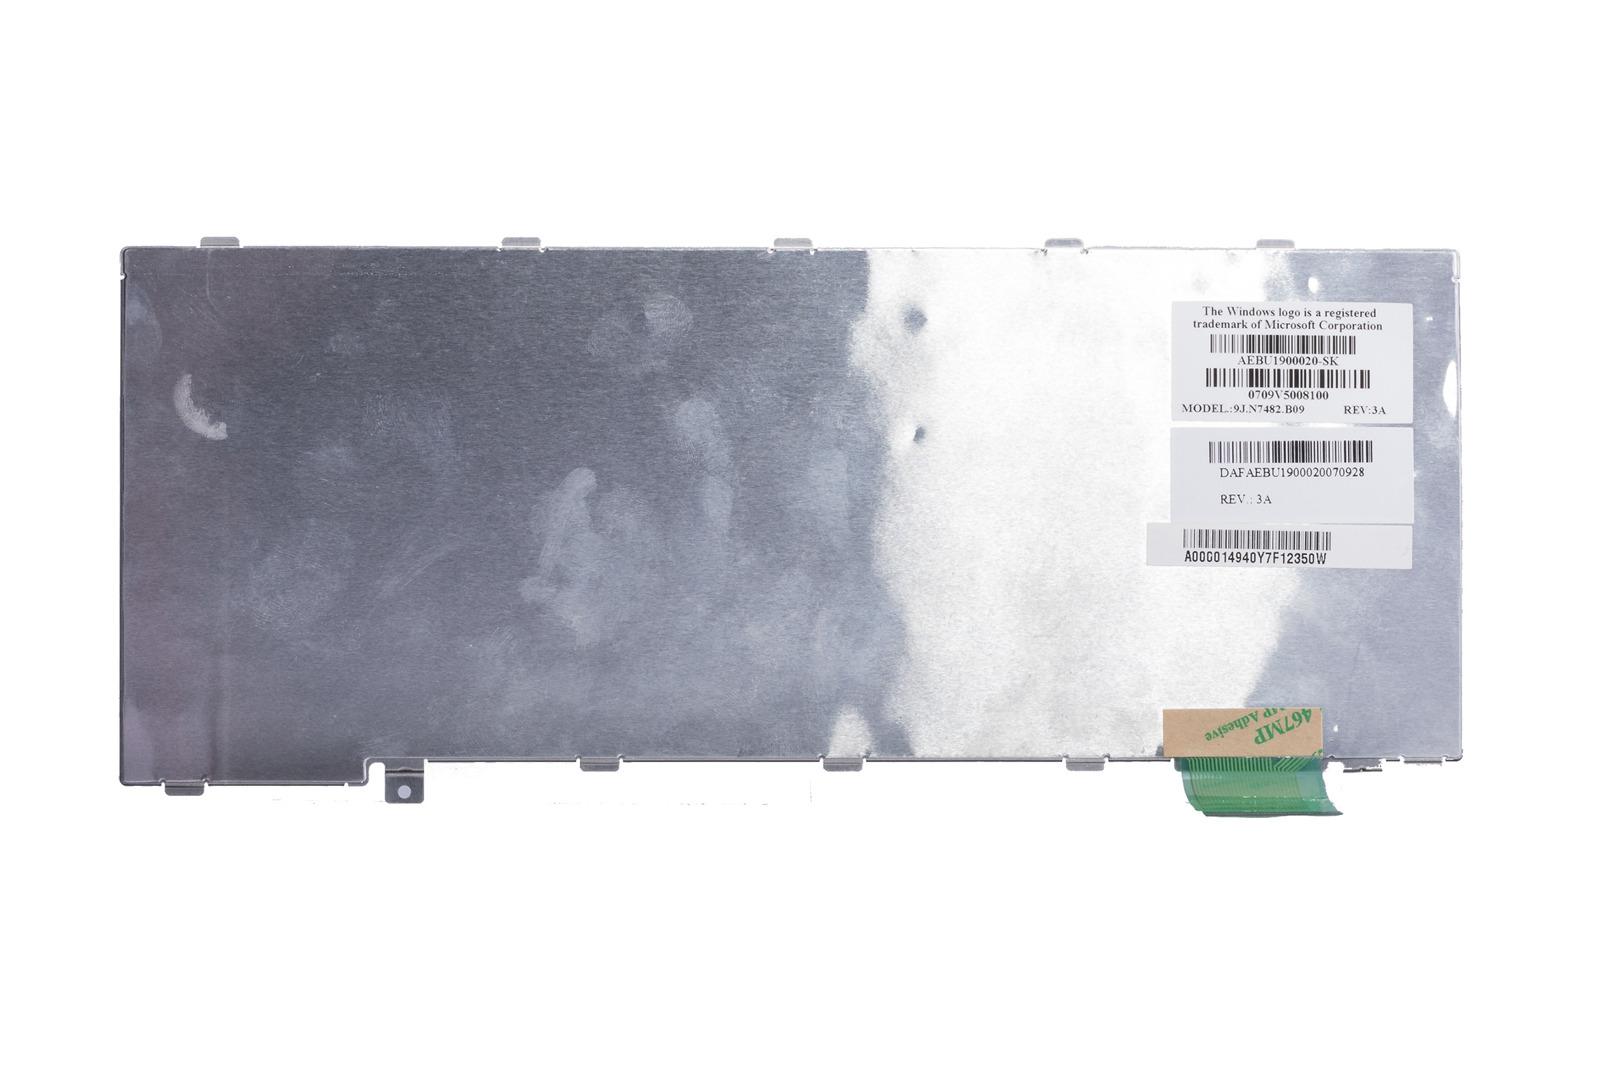 Keyboard Toshiba silver A000014940 (Slovak)